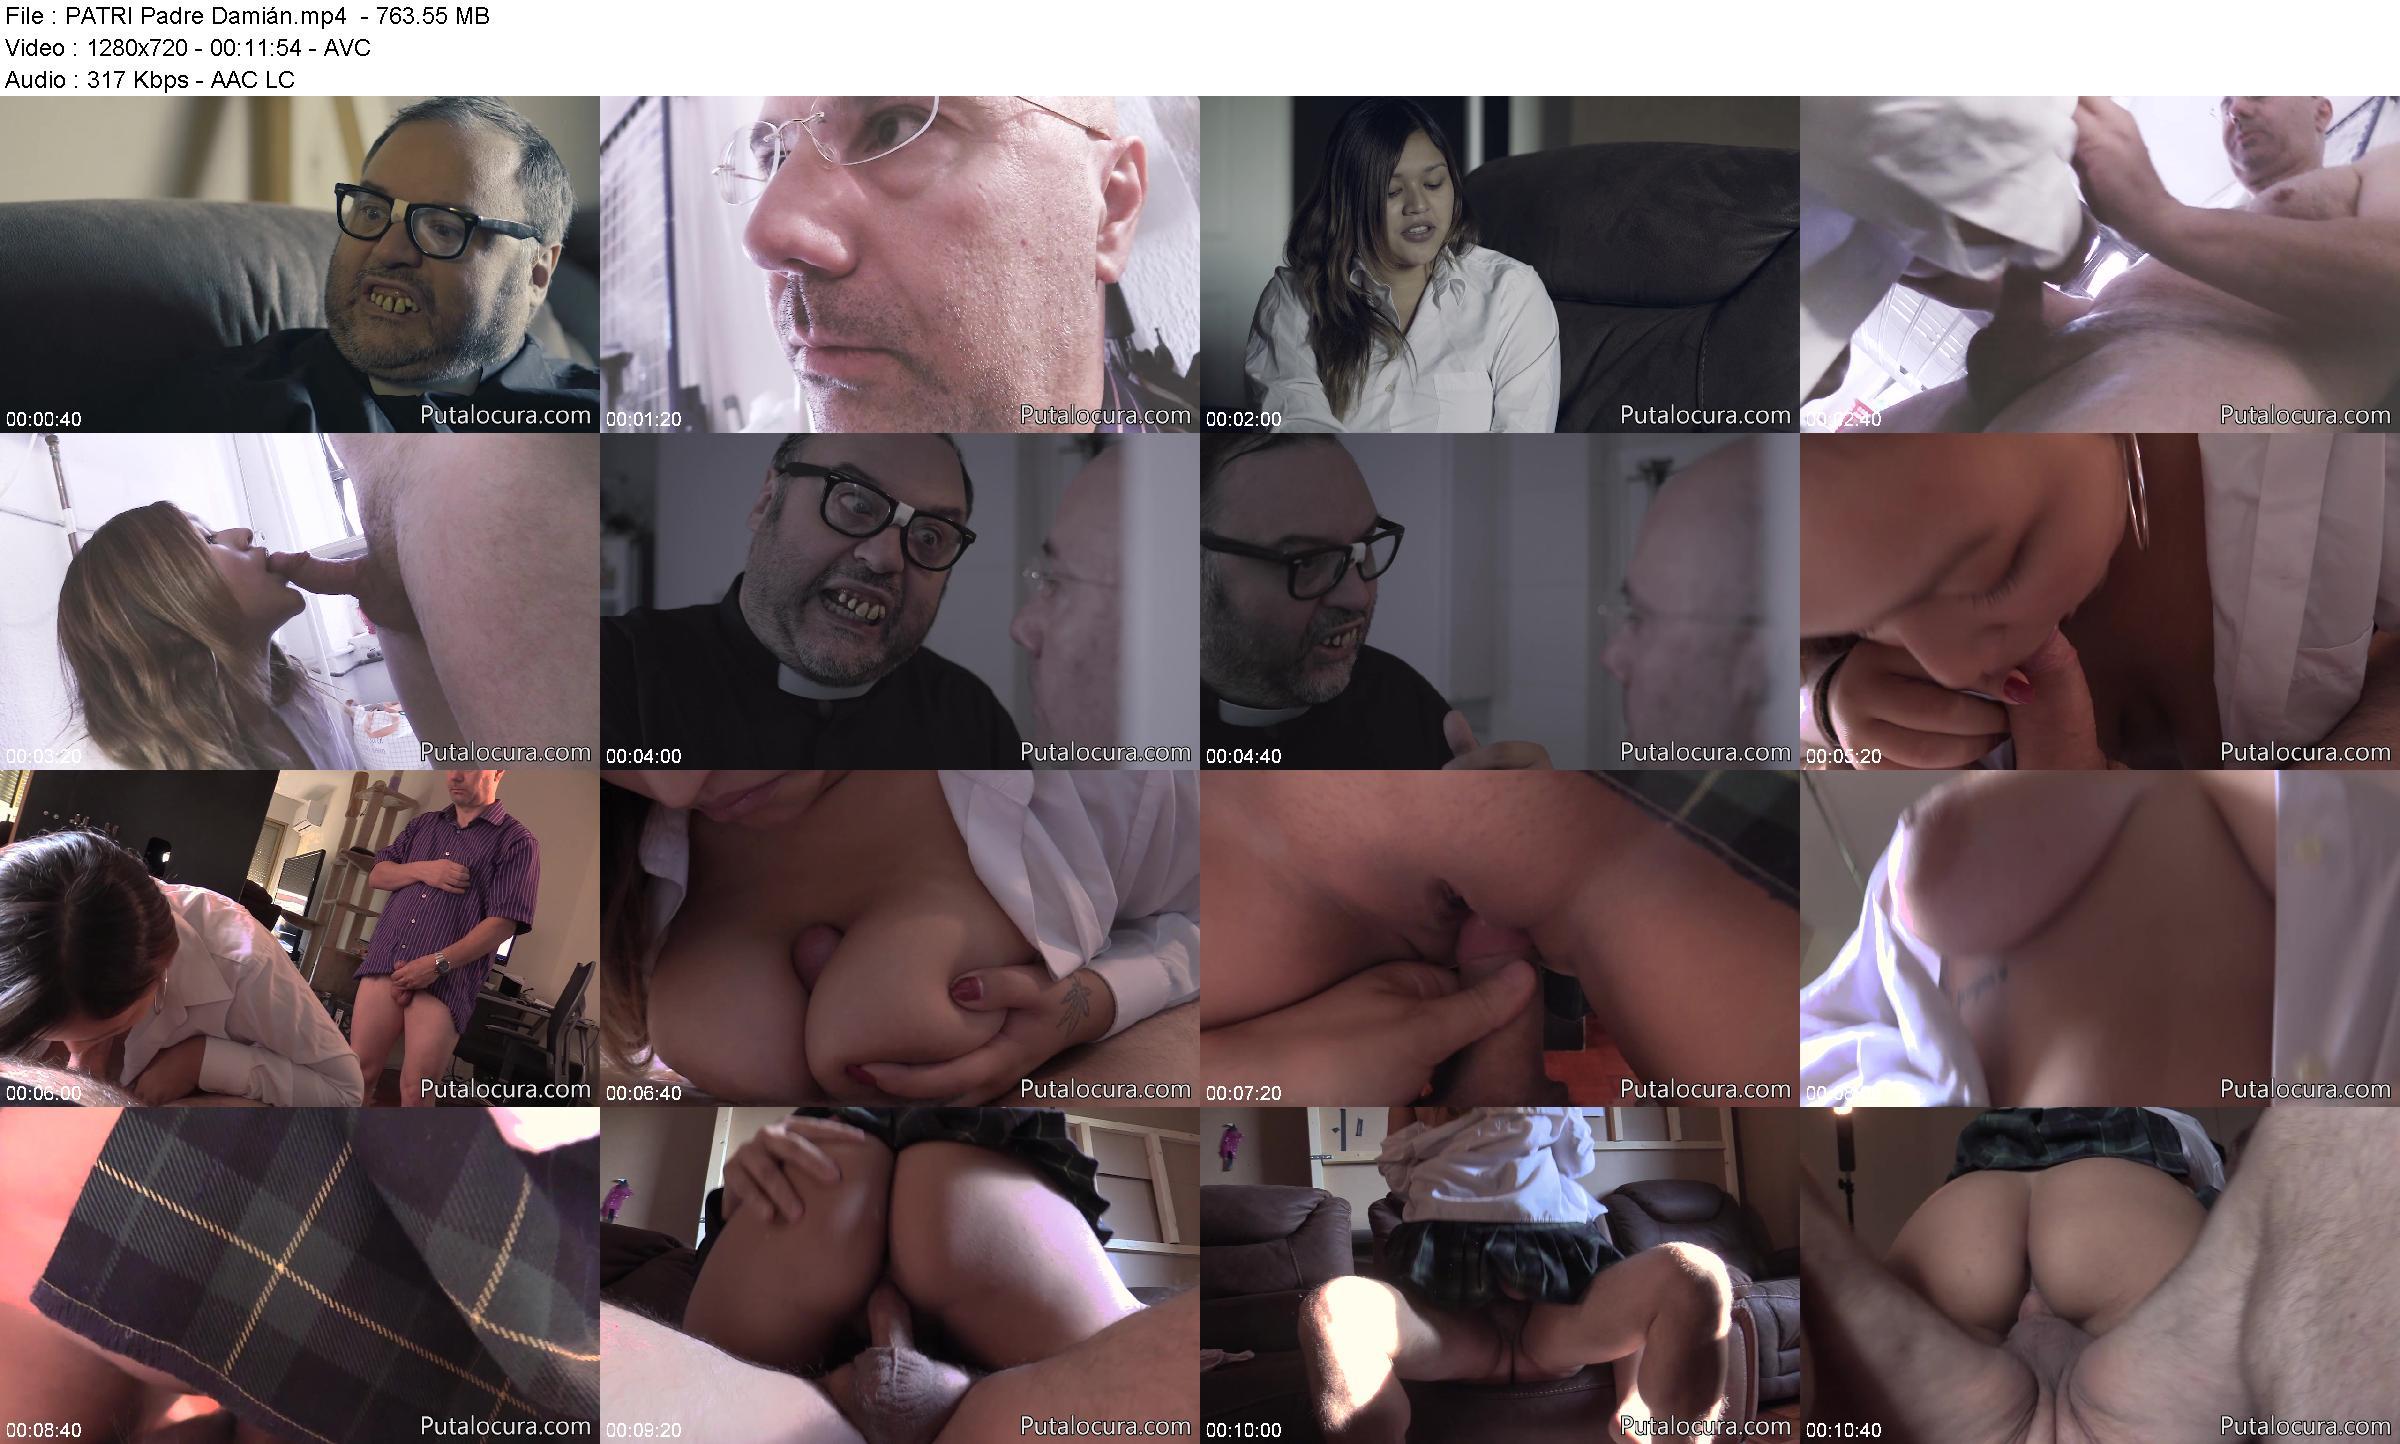 Torbe Romina Padre Damian Free Porn Galery Pics, Torbe Romina Padre Damian Online Porn